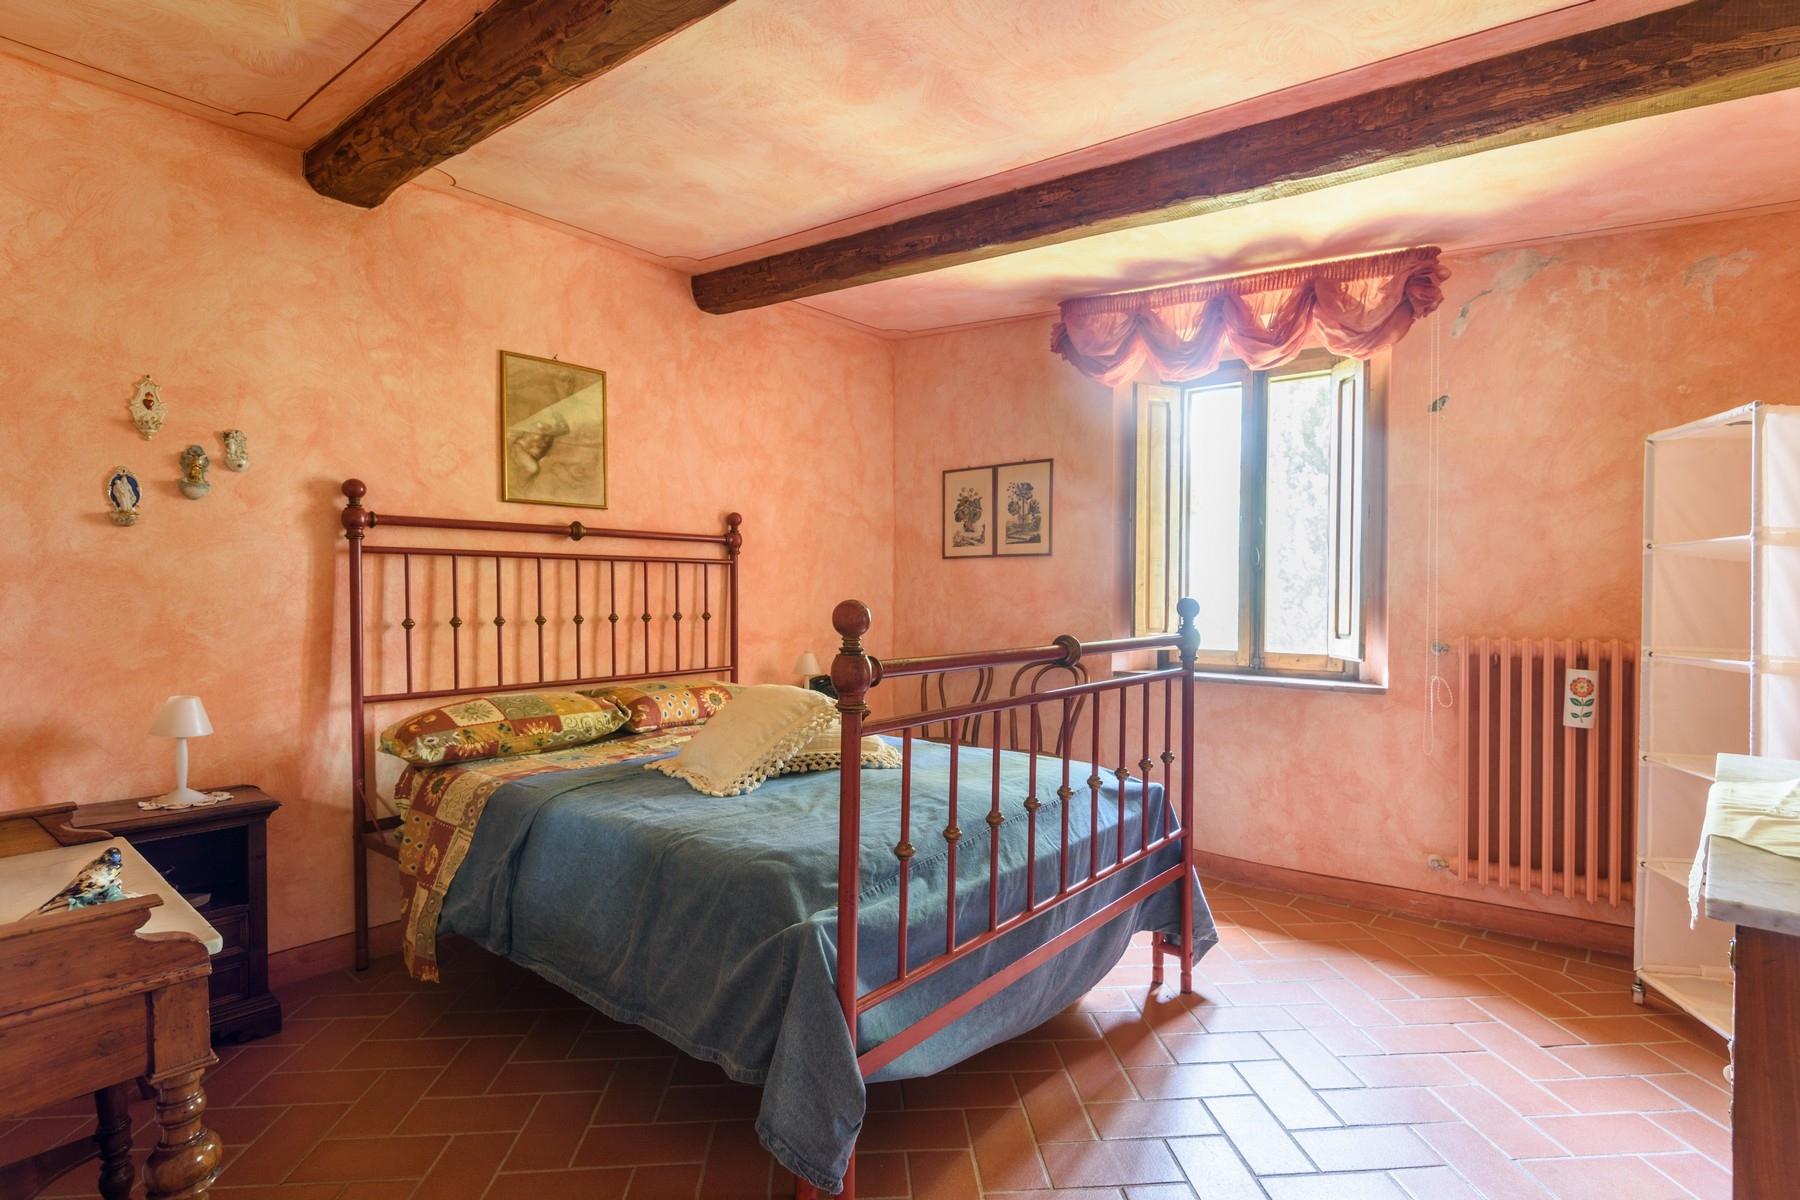 Villa in Vendita a Greve In Chianti: 5 locali, 491 mq - Foto 16